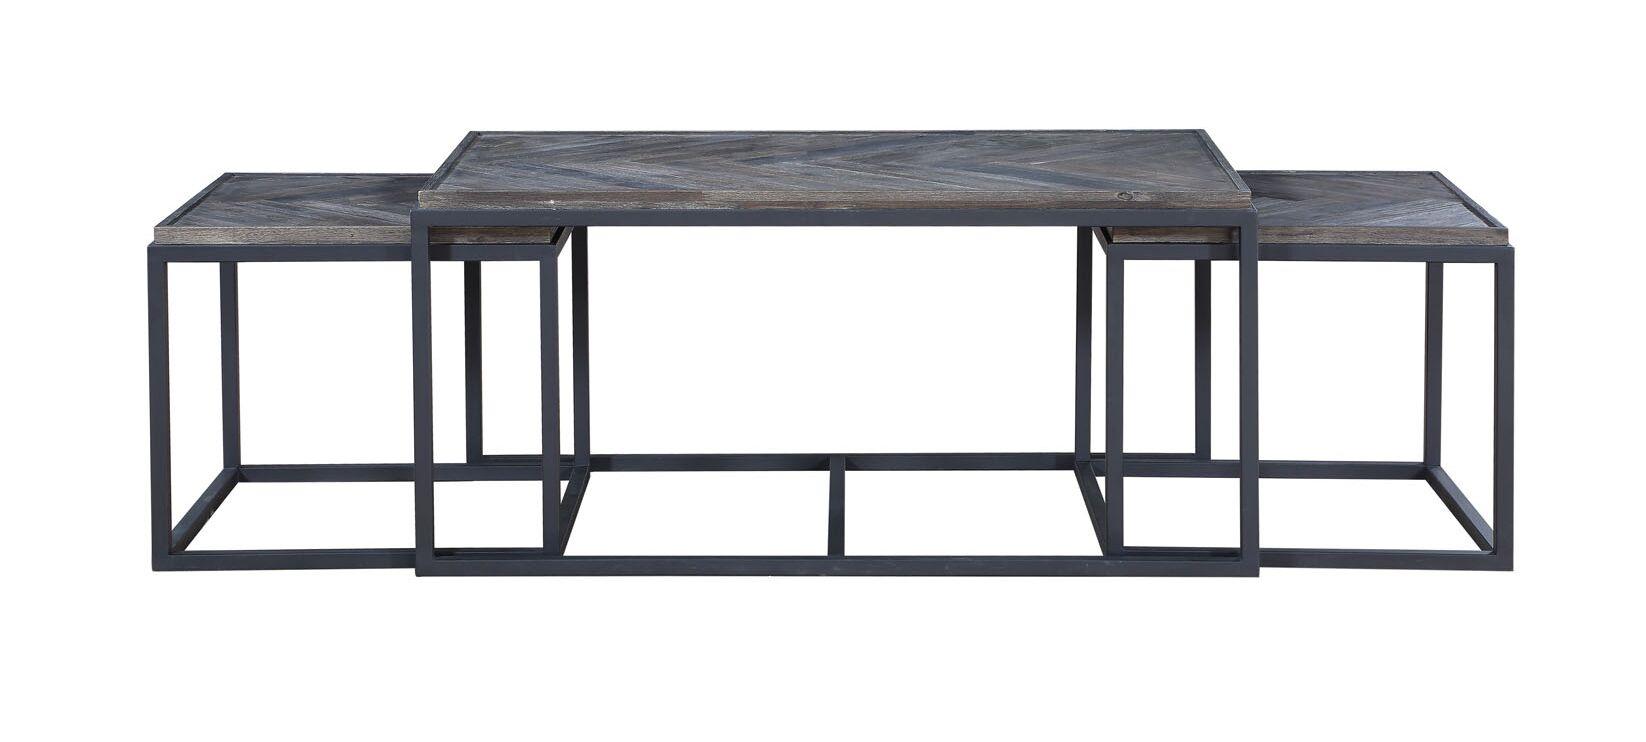 Kaelyn 3 Piece Nesting Tables